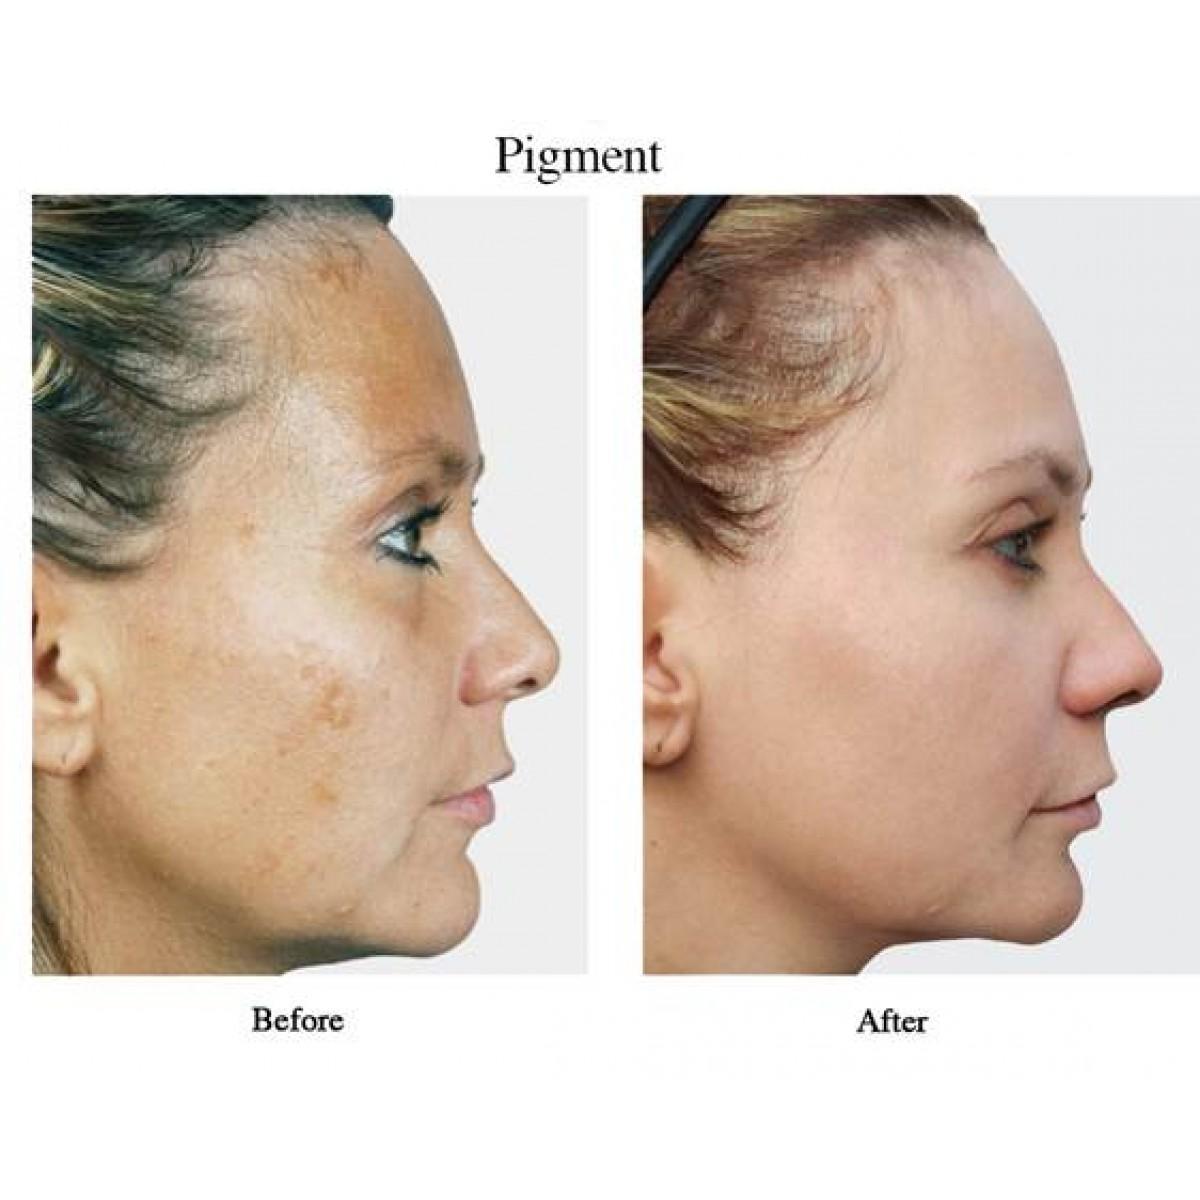 VisaoMD Peel - pigment